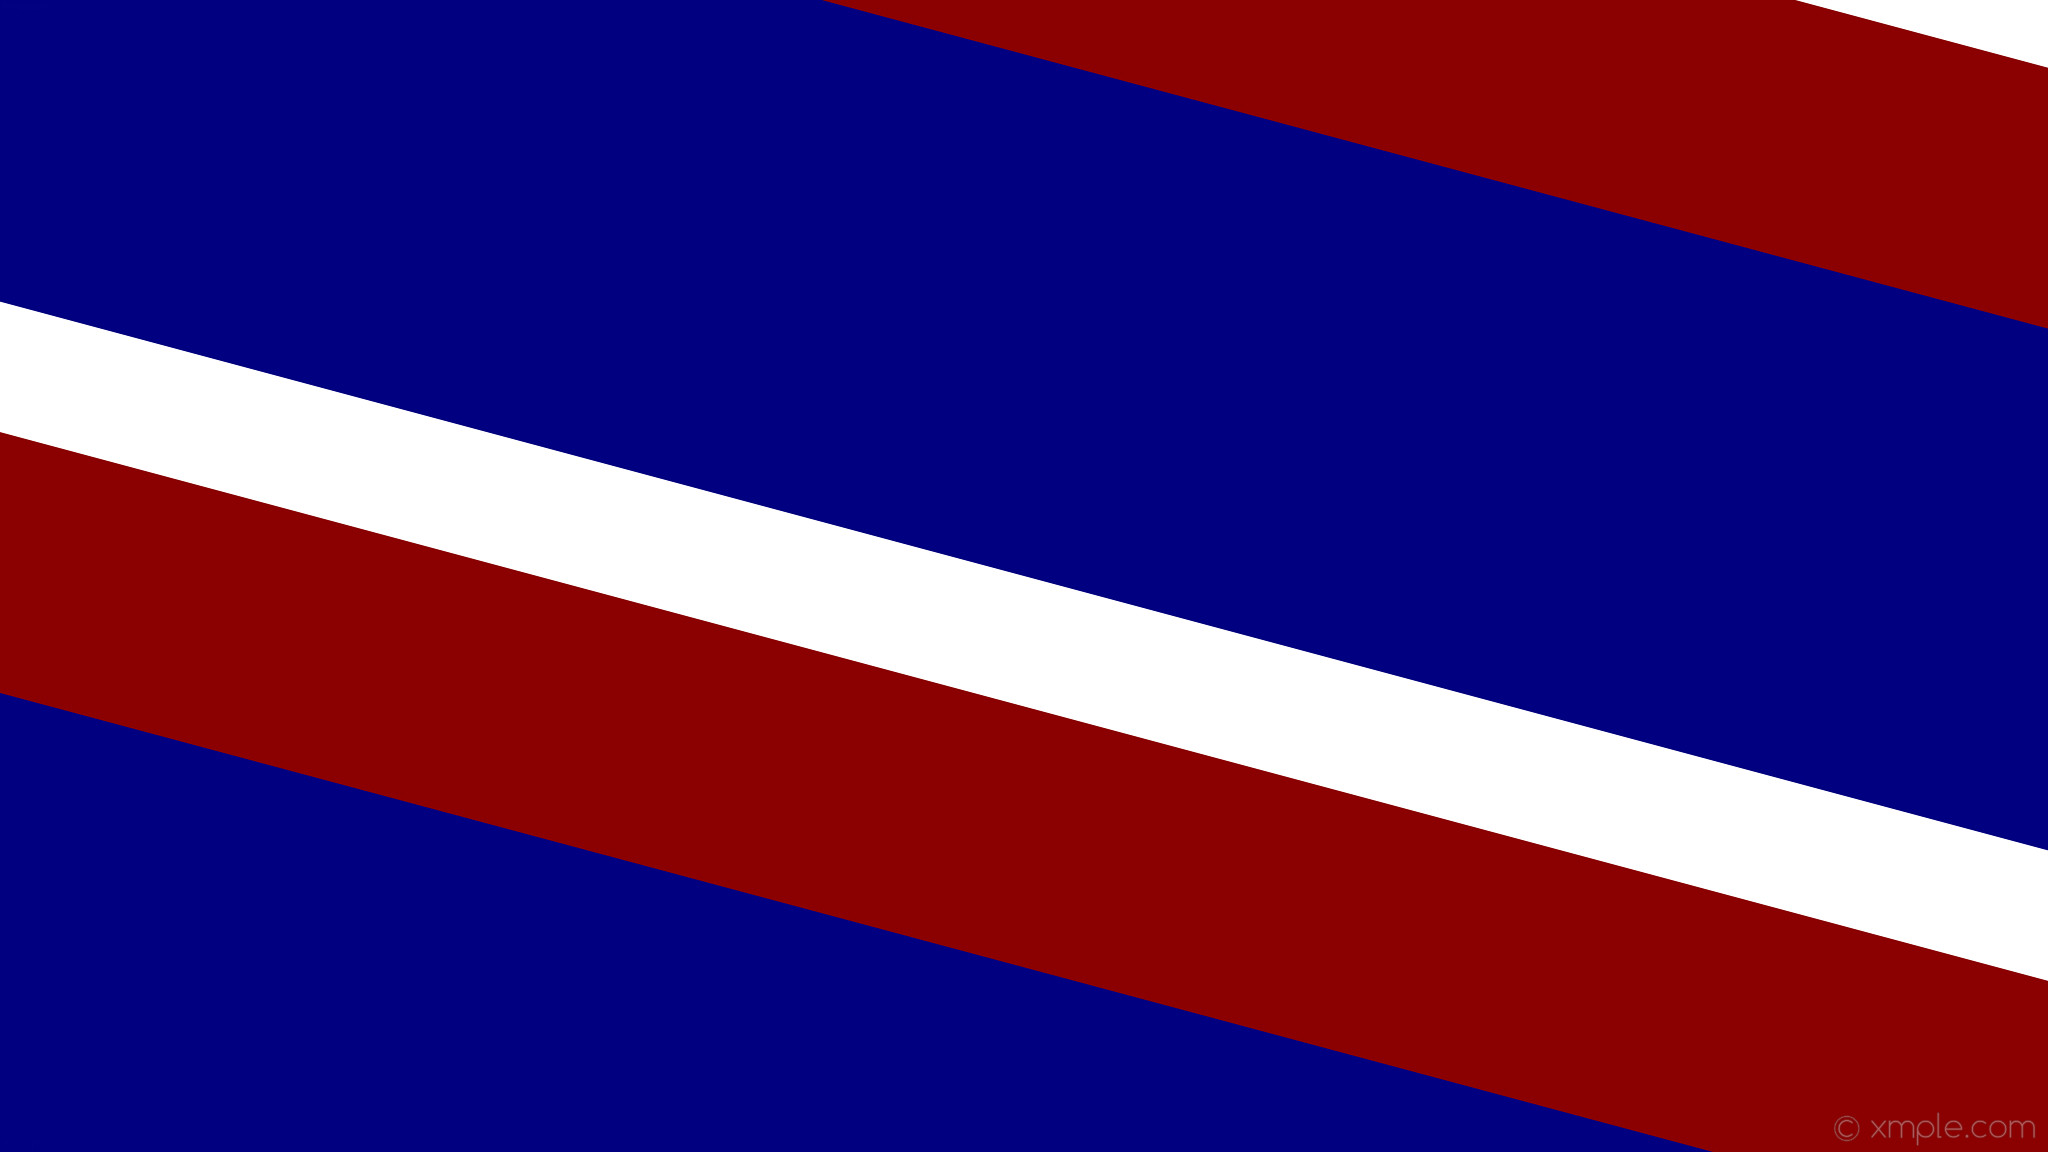 wallpaper streaks red white lines blue stripes dark red navy #ffffff  #8b0000 #000080